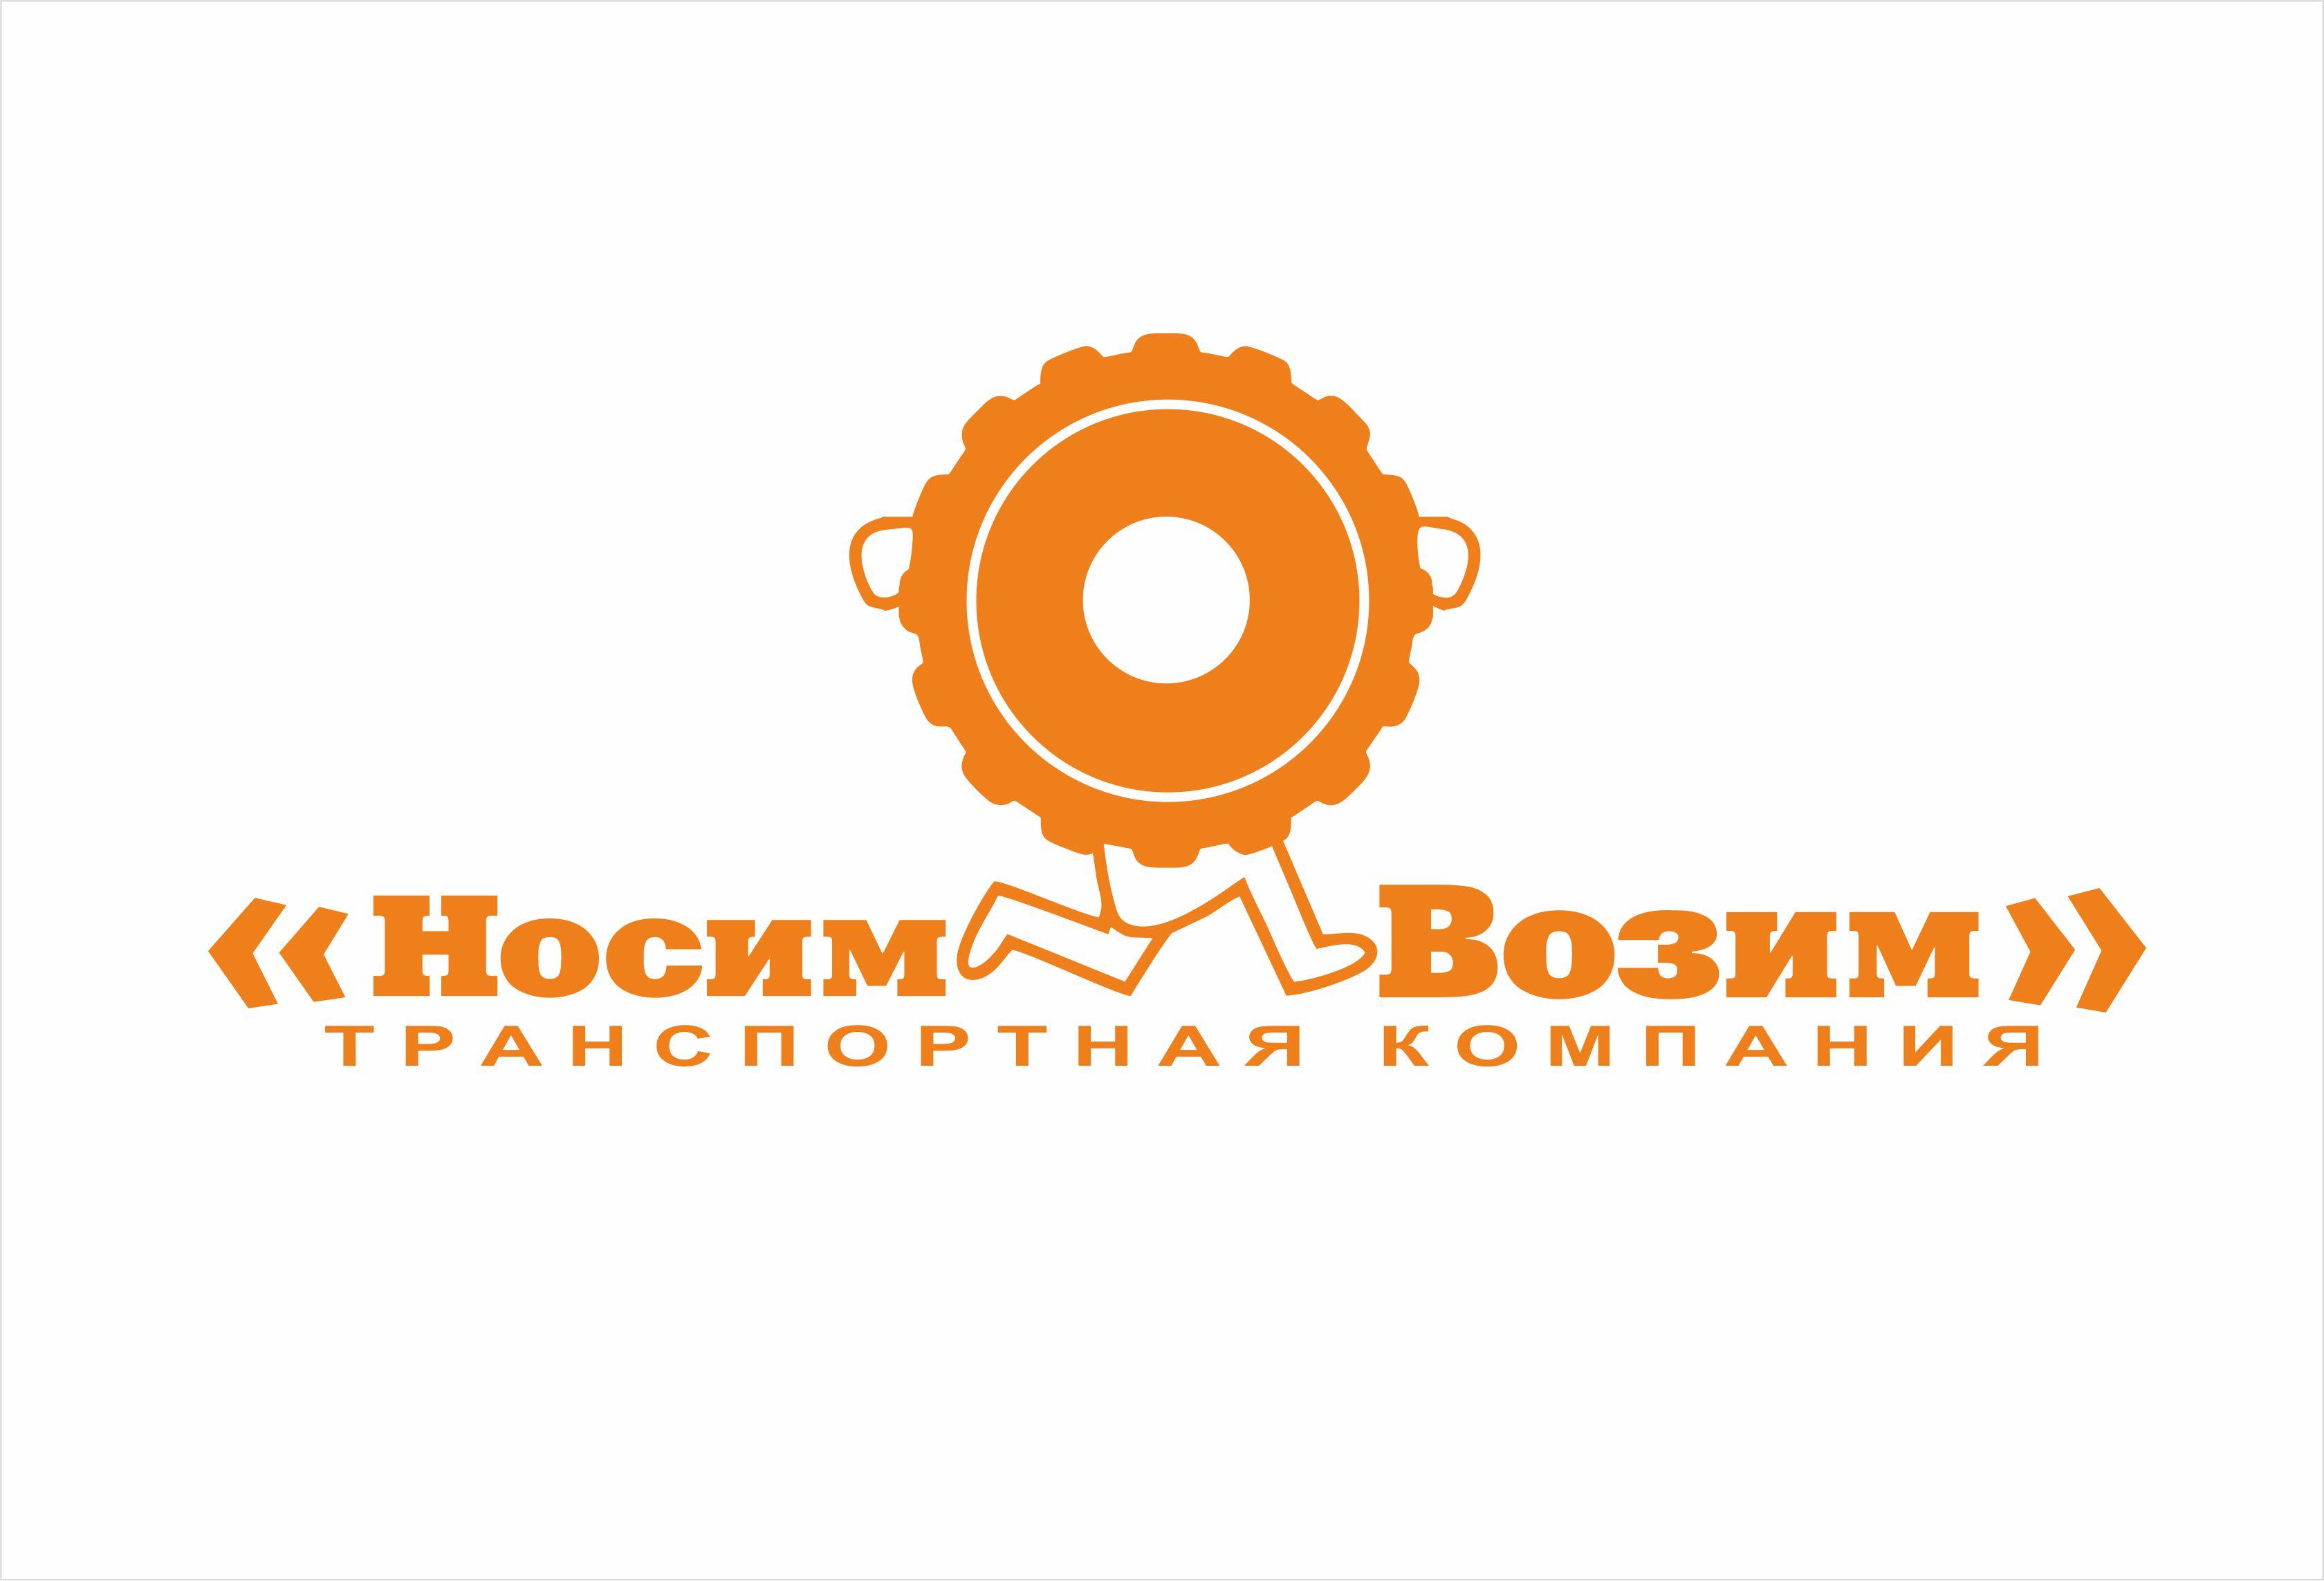 Логотип компании по перевозкам НосимВозим фото f_3335cf7a116eb0cb.jpg